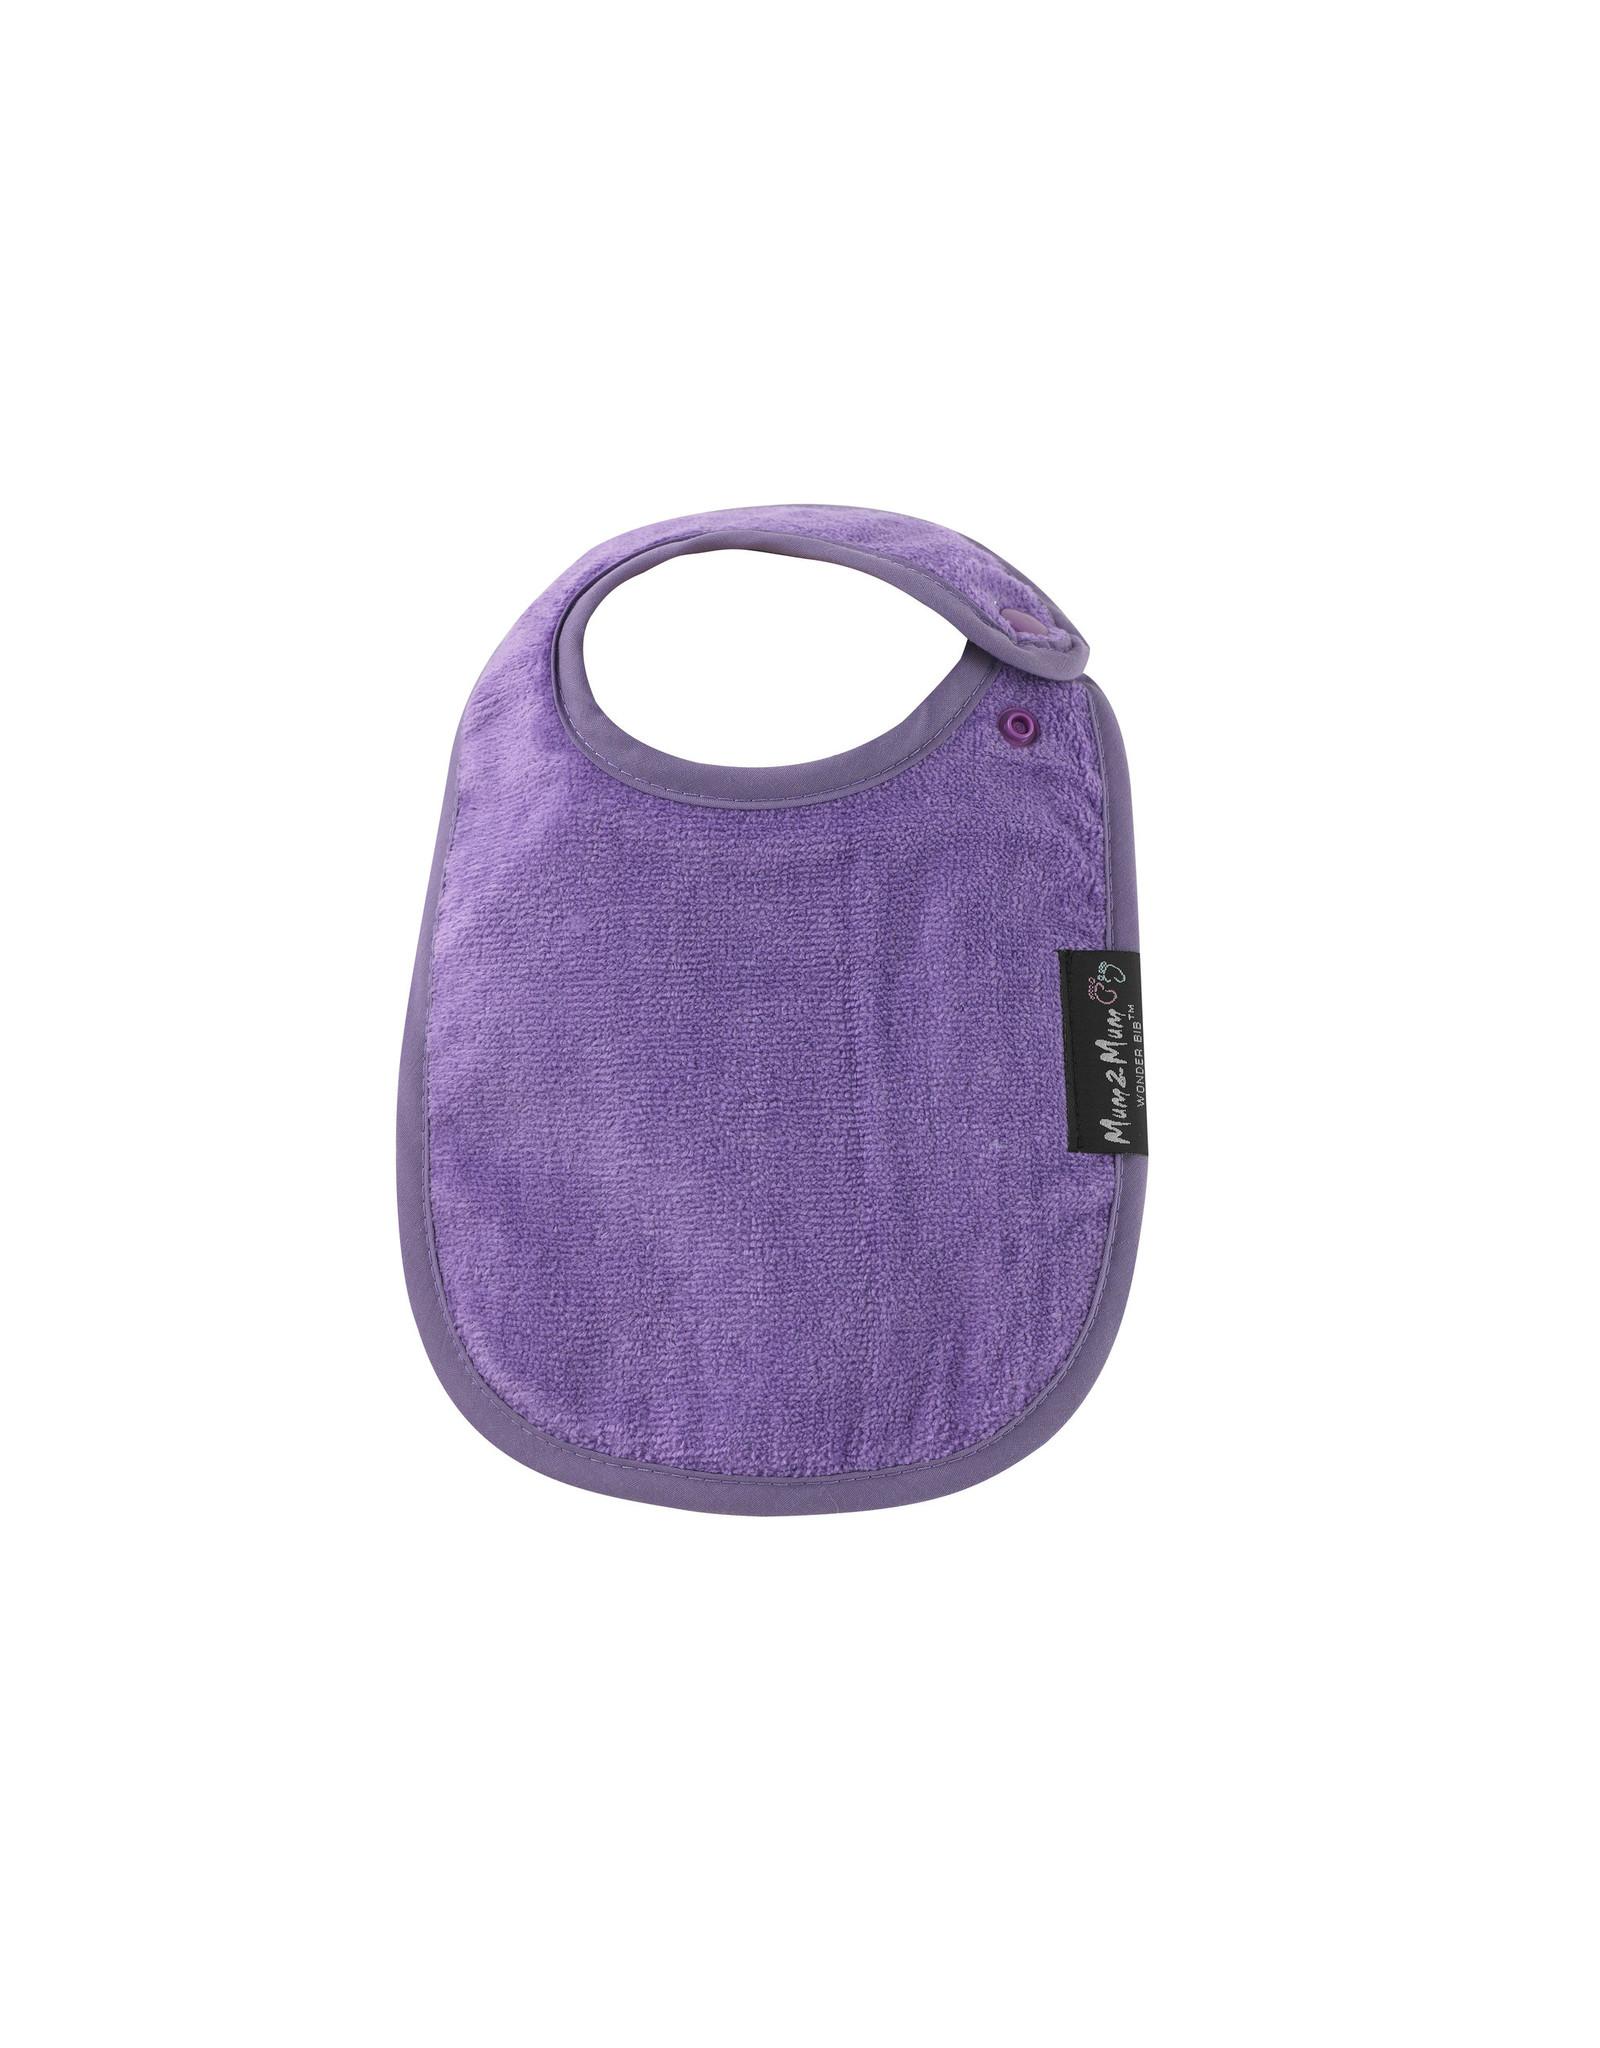 Mum2Mum Mum2Mum Infant Bib Purple